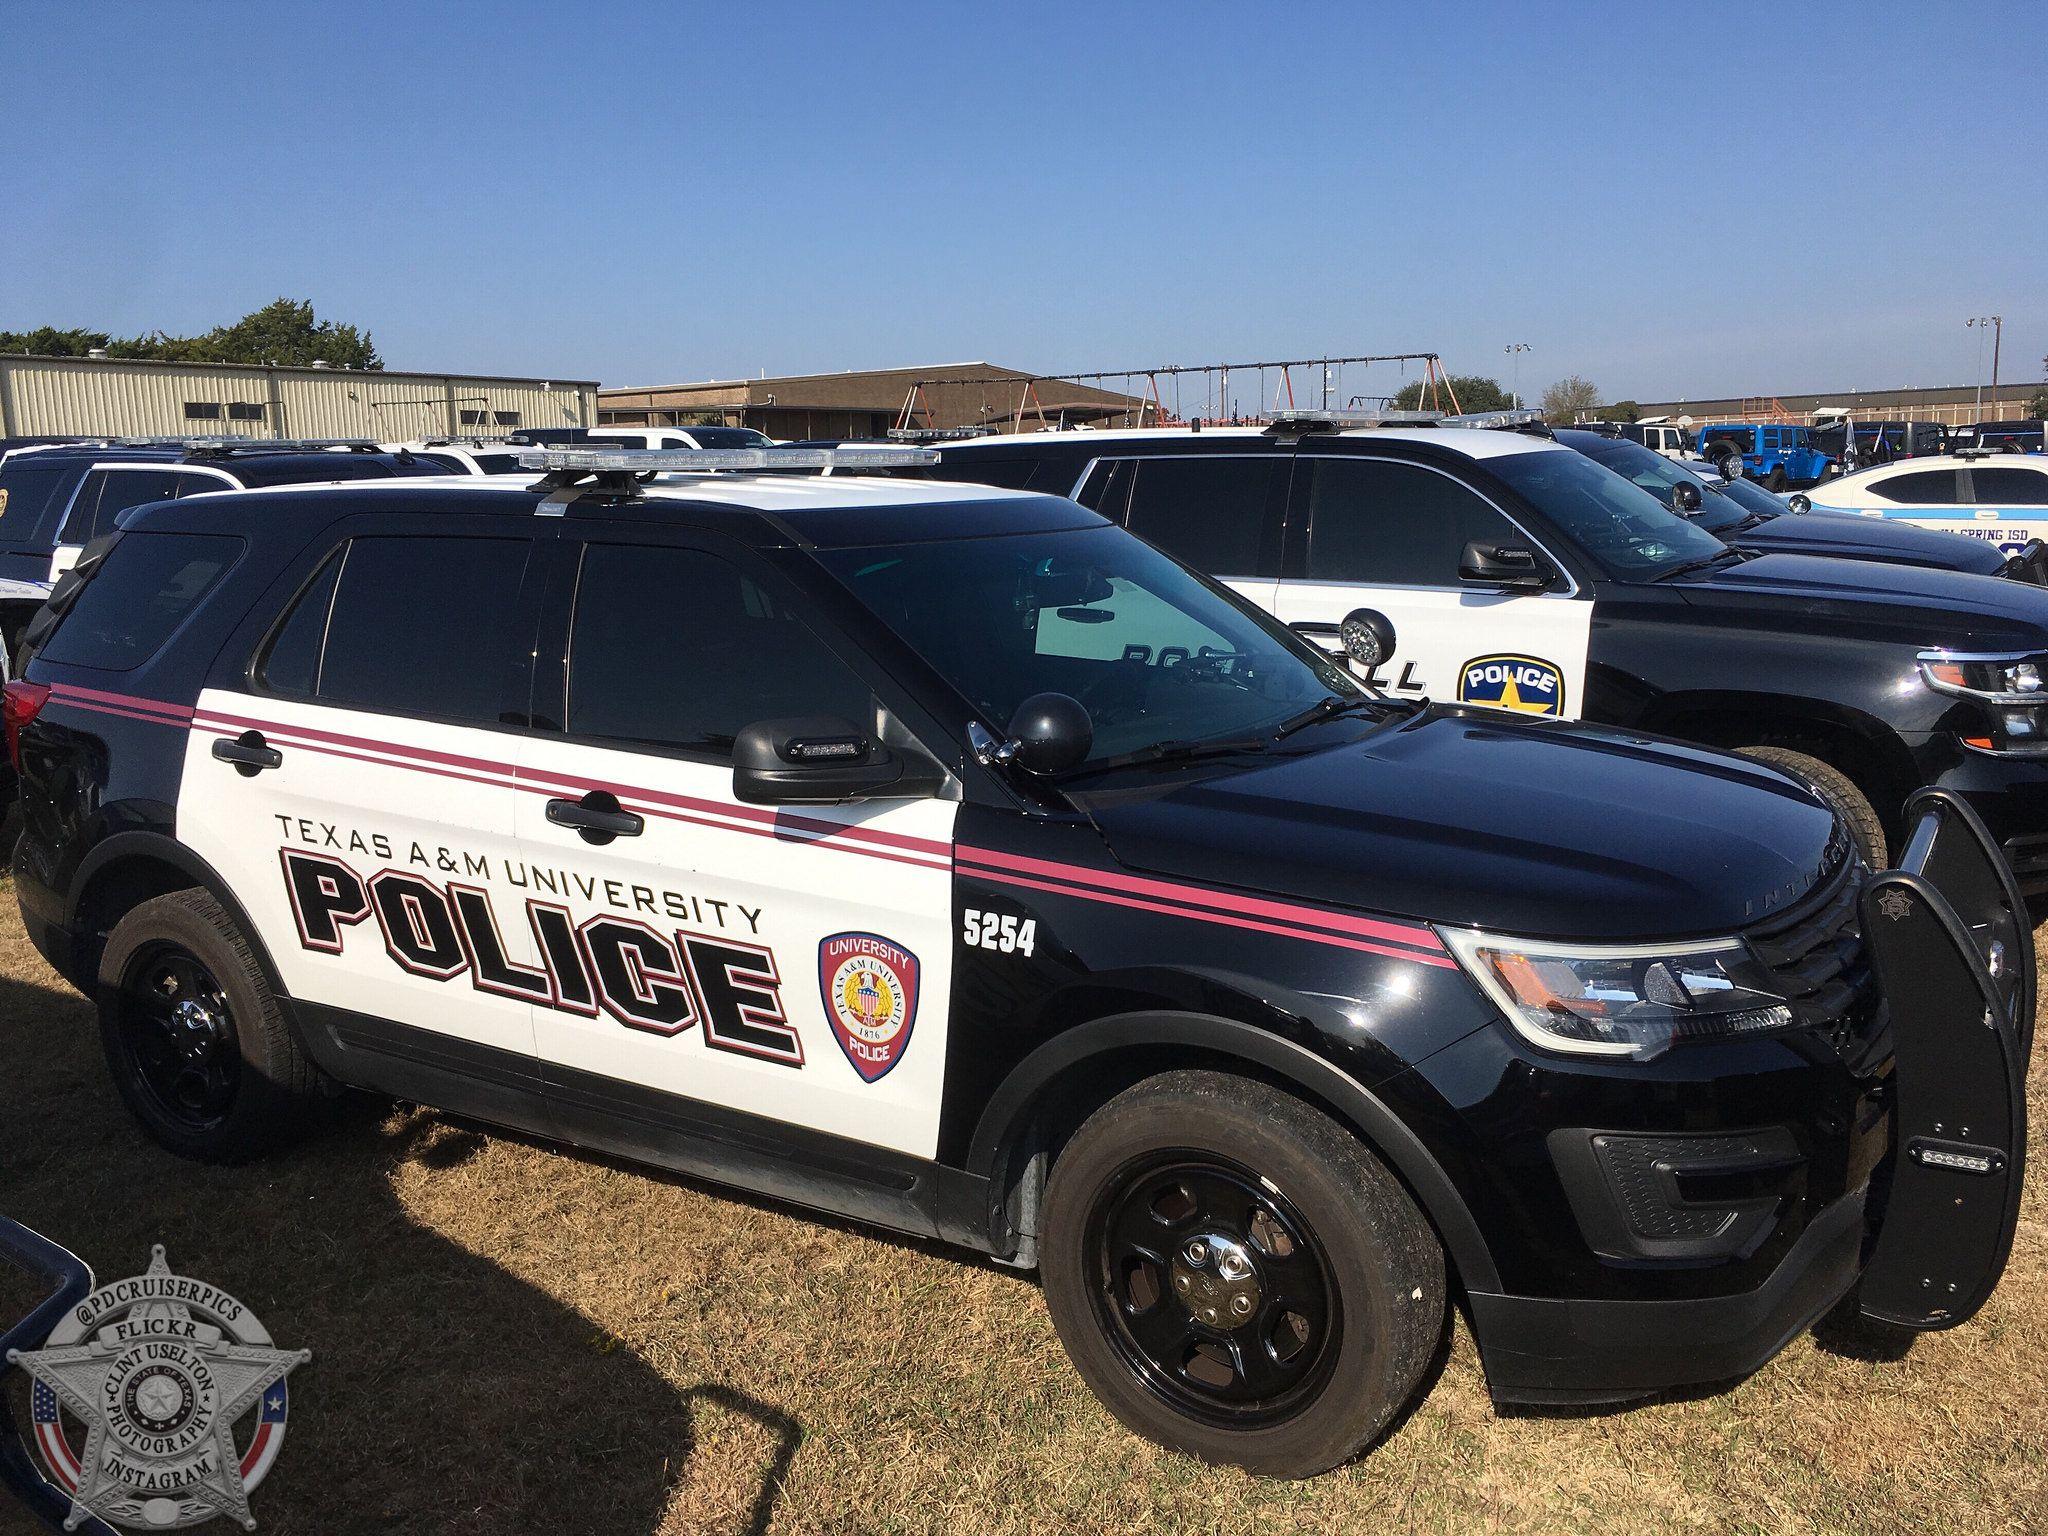 Texas A M University Police Police Cars Police Texas A M University